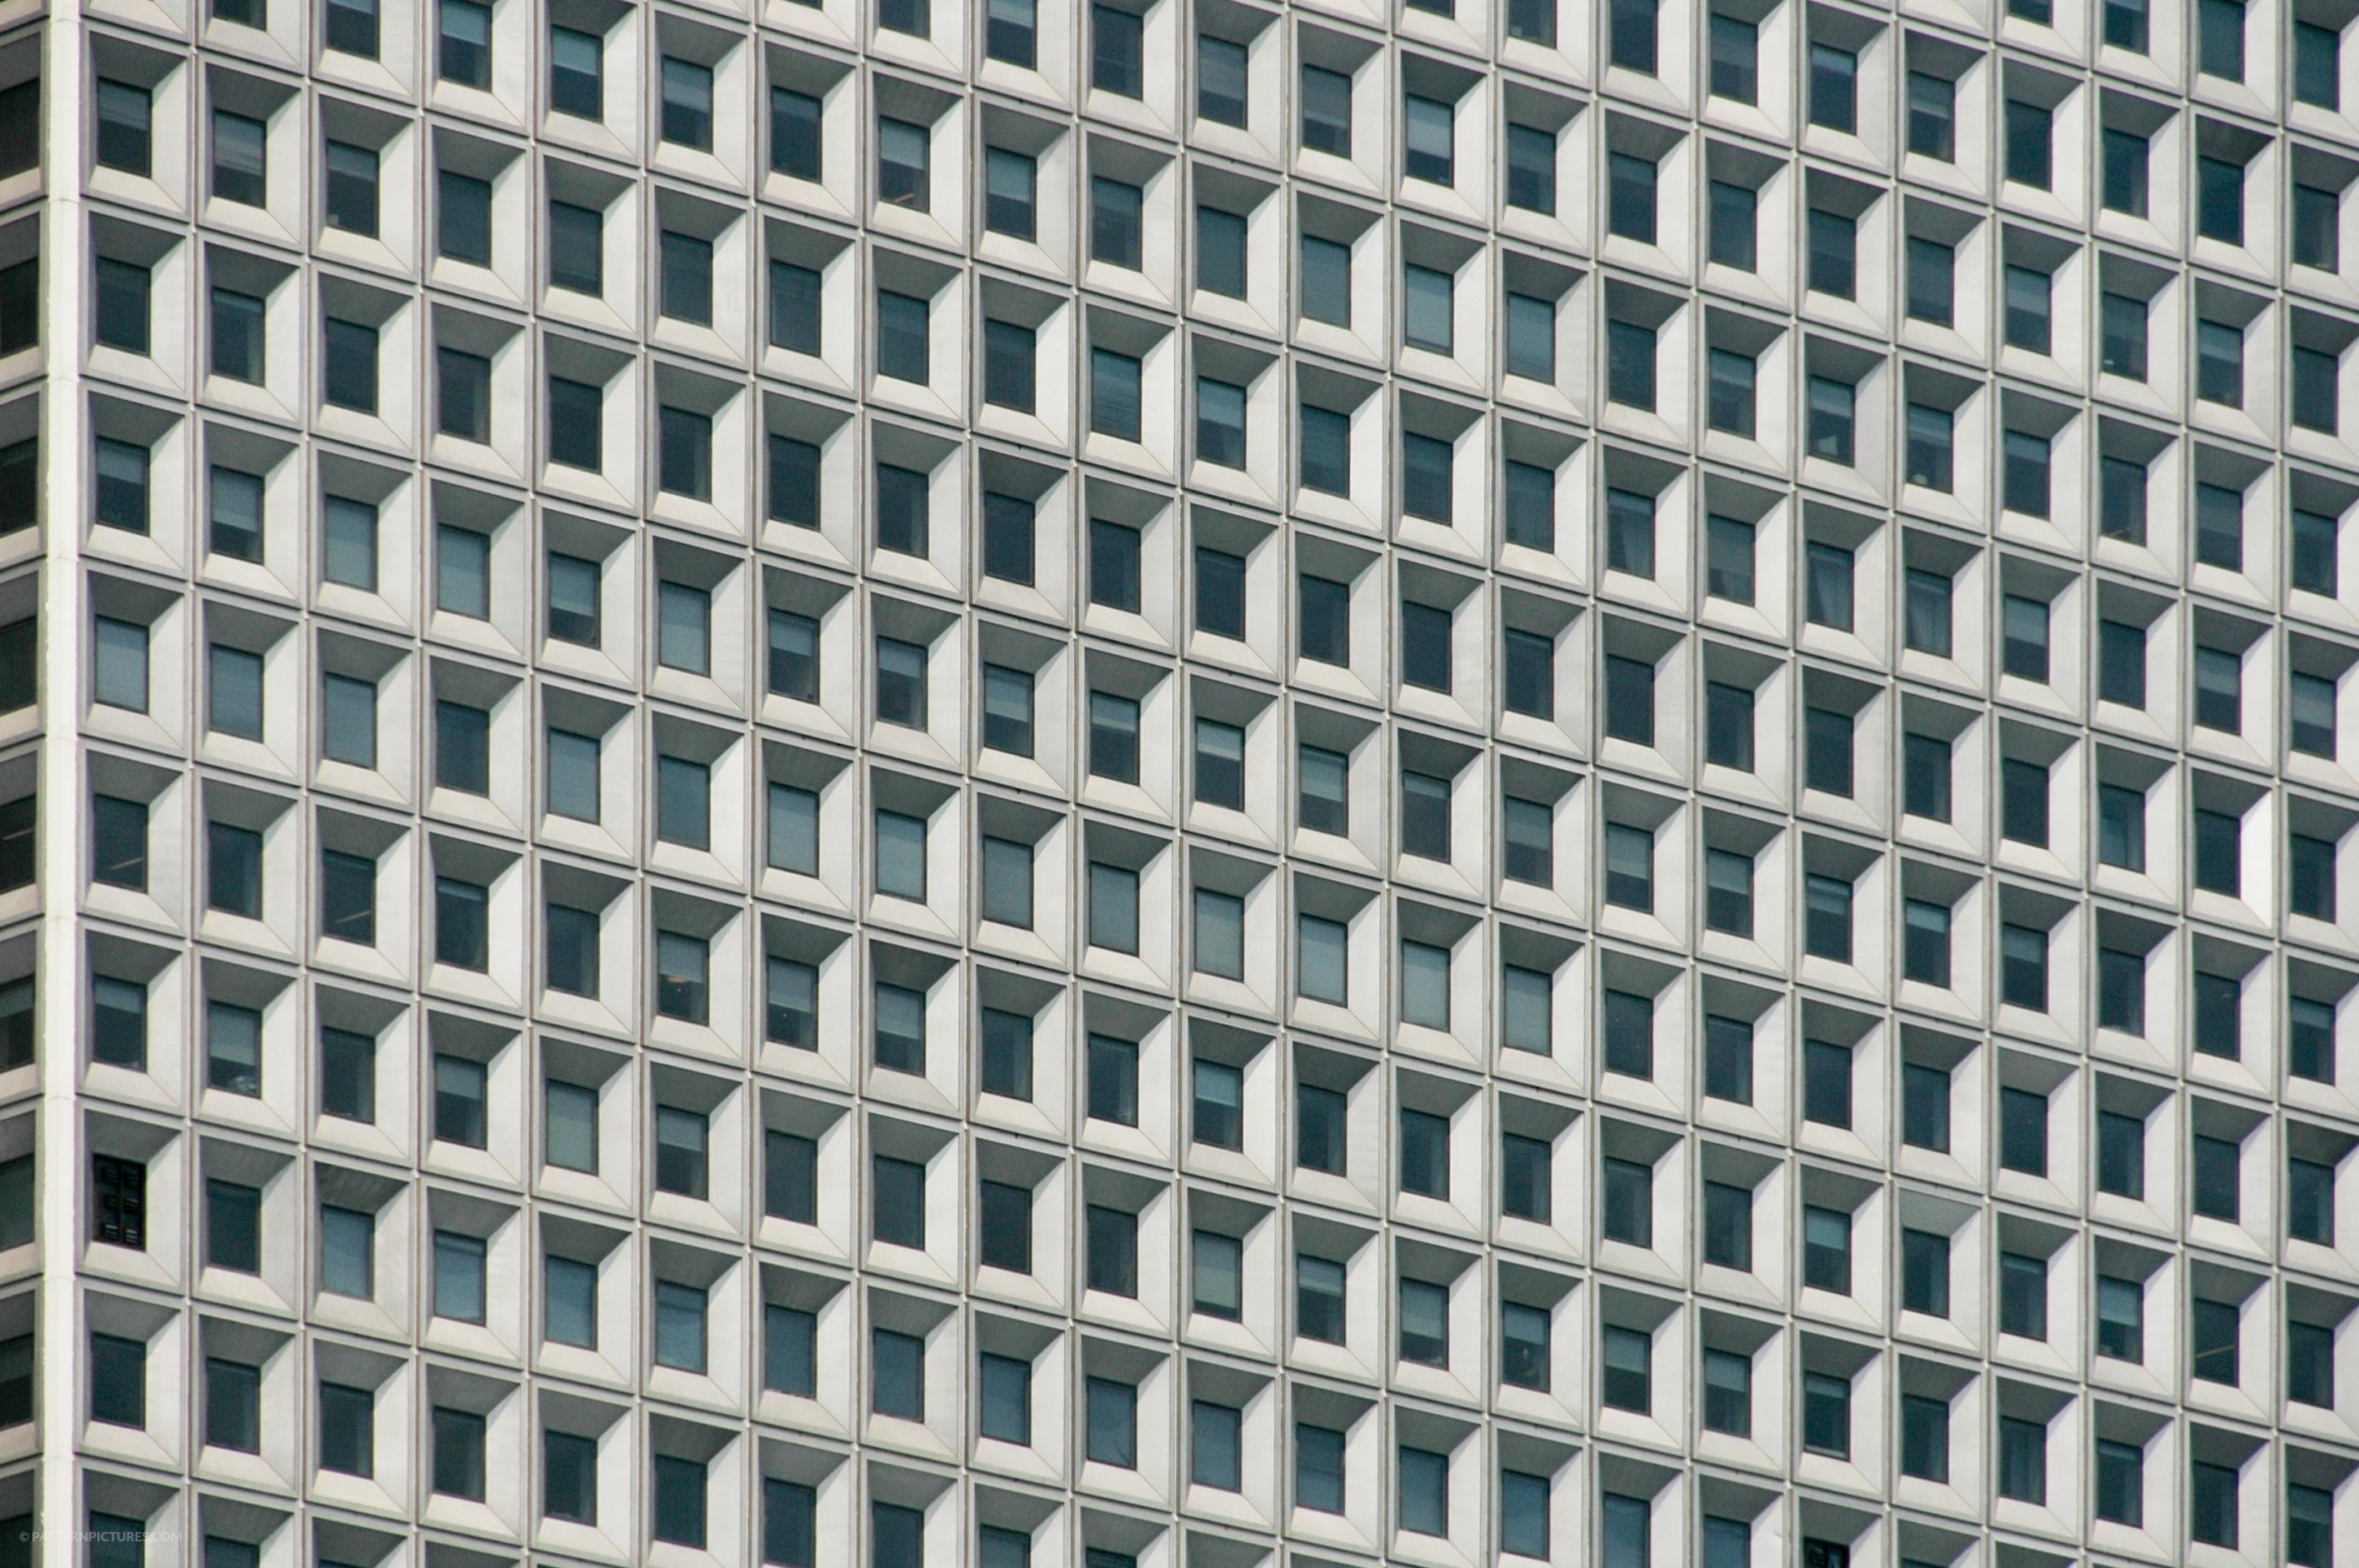 NY repetition windows Manhattan Hudson